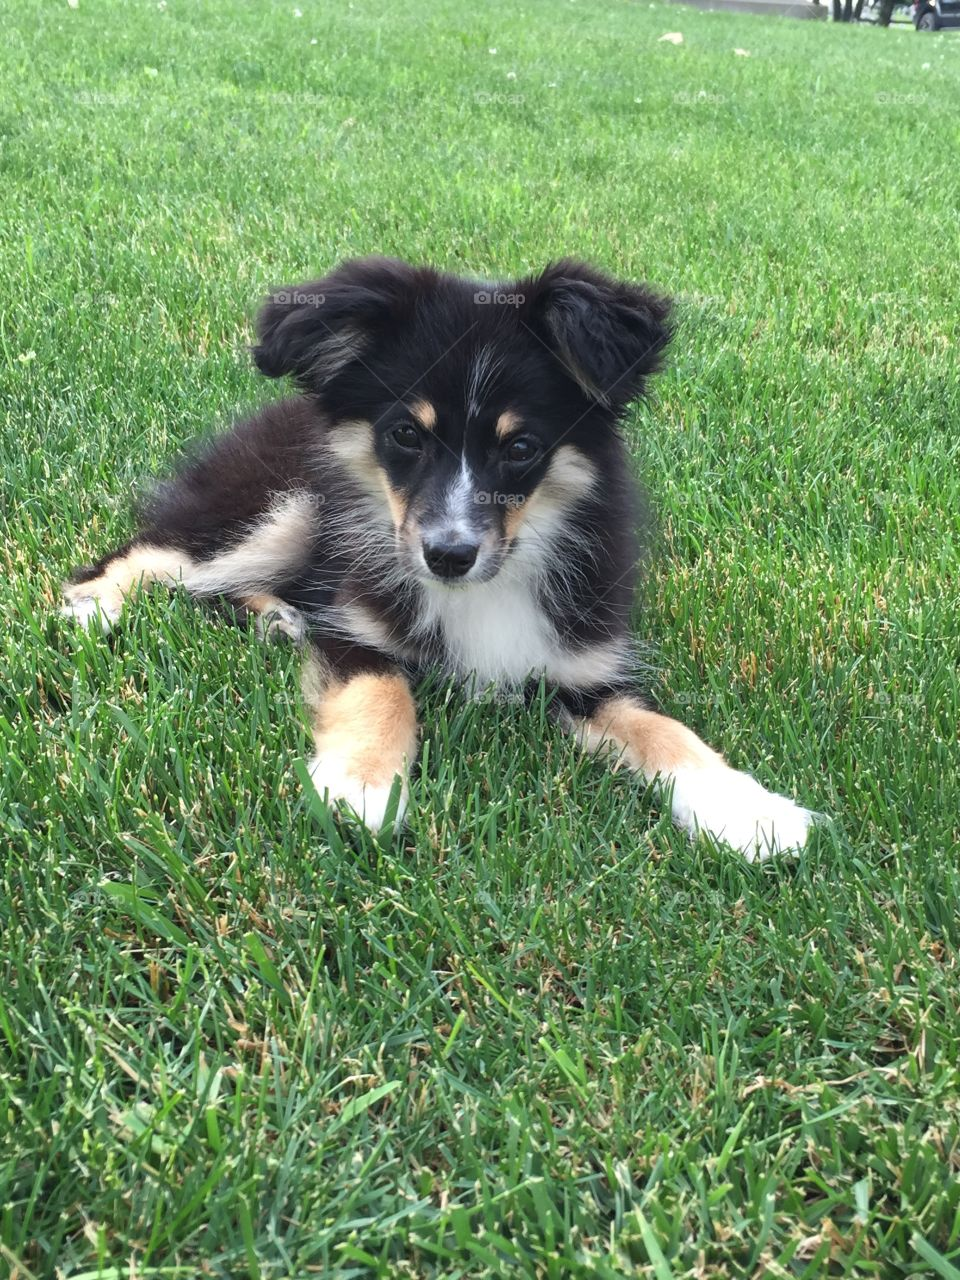 A puppy dog sitting on grass